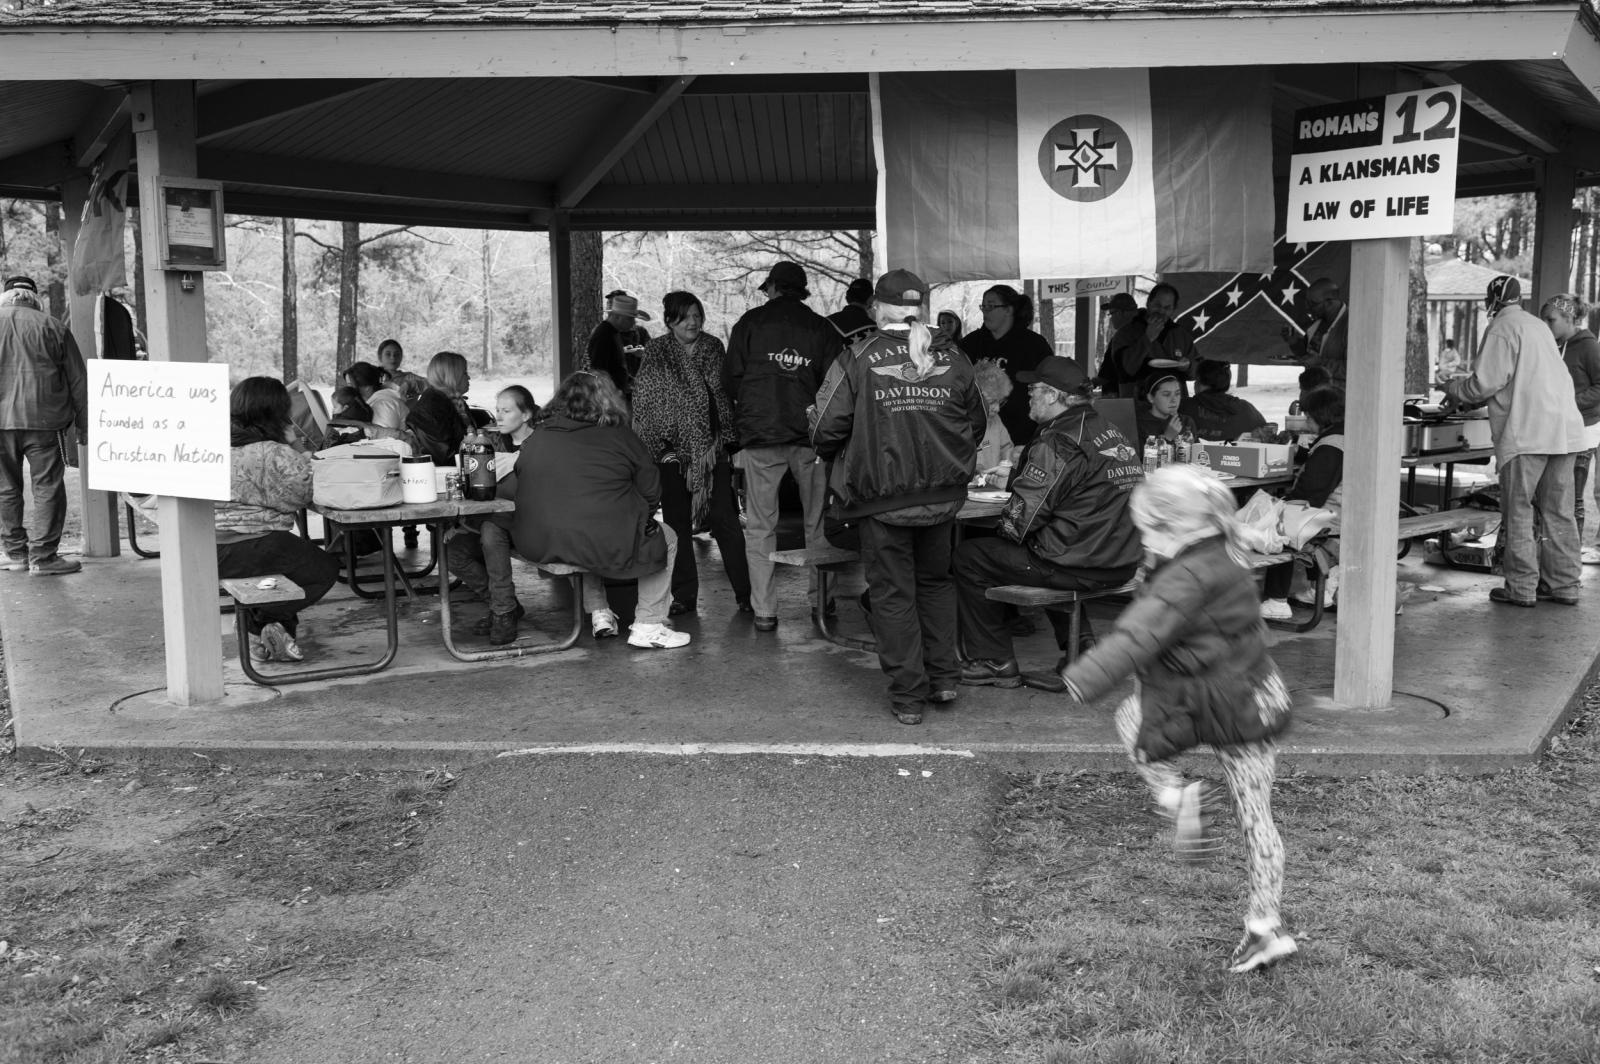 Missouri.A group of Klan folk gather for a wedding at the Fort Davison state historic site and the Missouri Civil War battle of Pilot Knob.